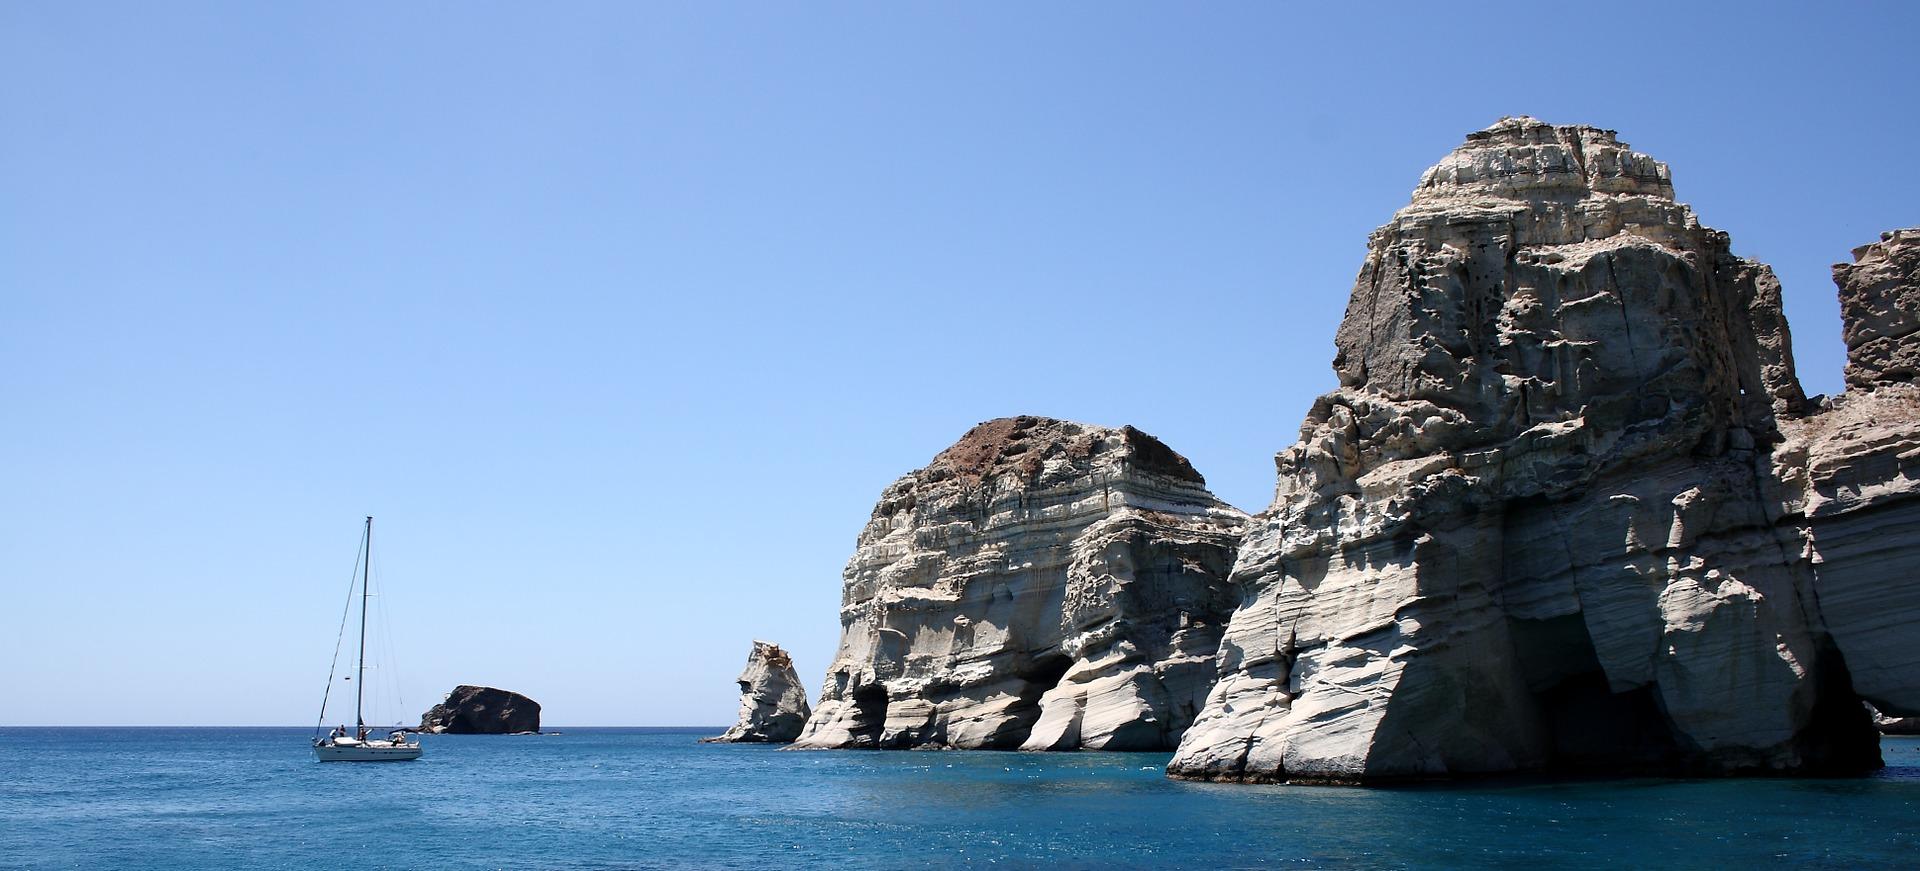 Milos island (Picture by Steen Jepsen/ Pixabay)